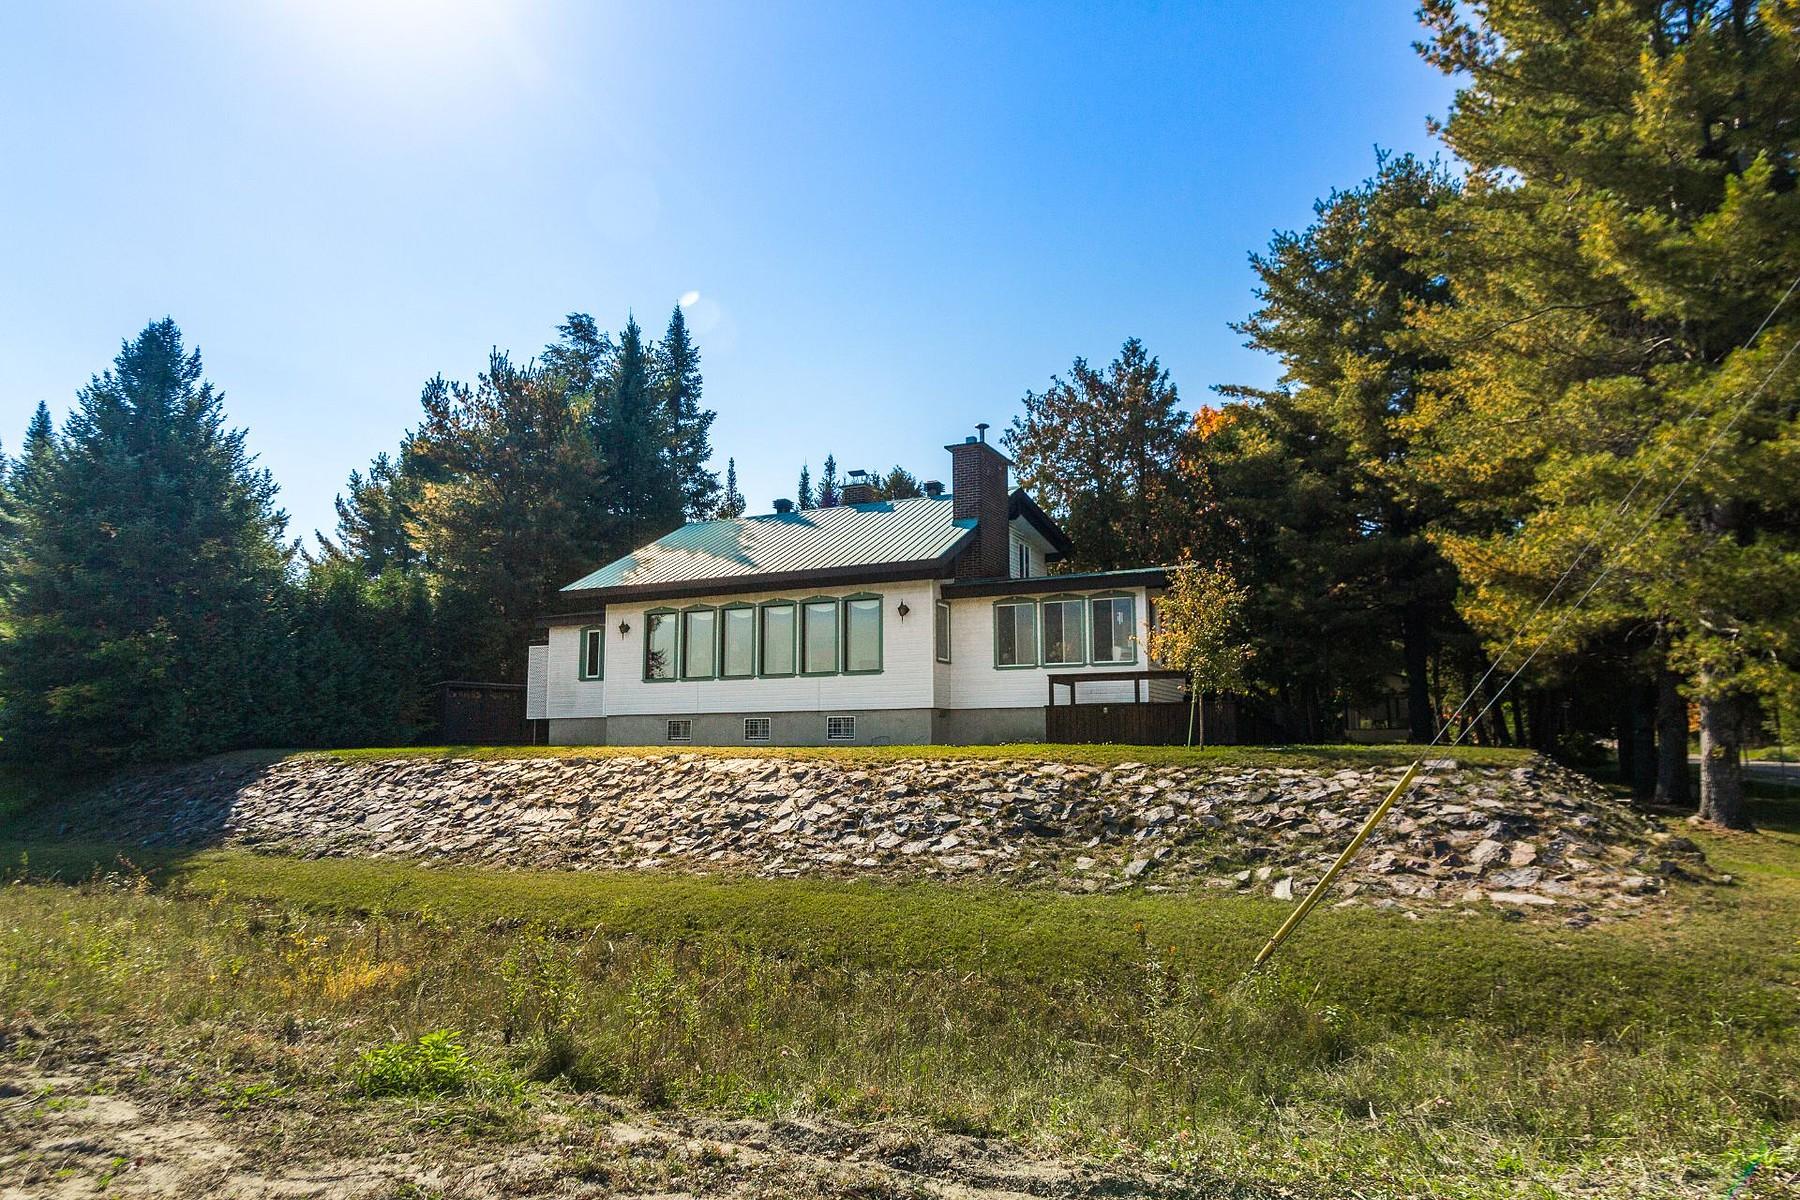 Single Family Home for Sale at Rawdon, Lanaudière 4998 Rue de la Promenade-du-Lac Rawdon, J0K1S0 Canada